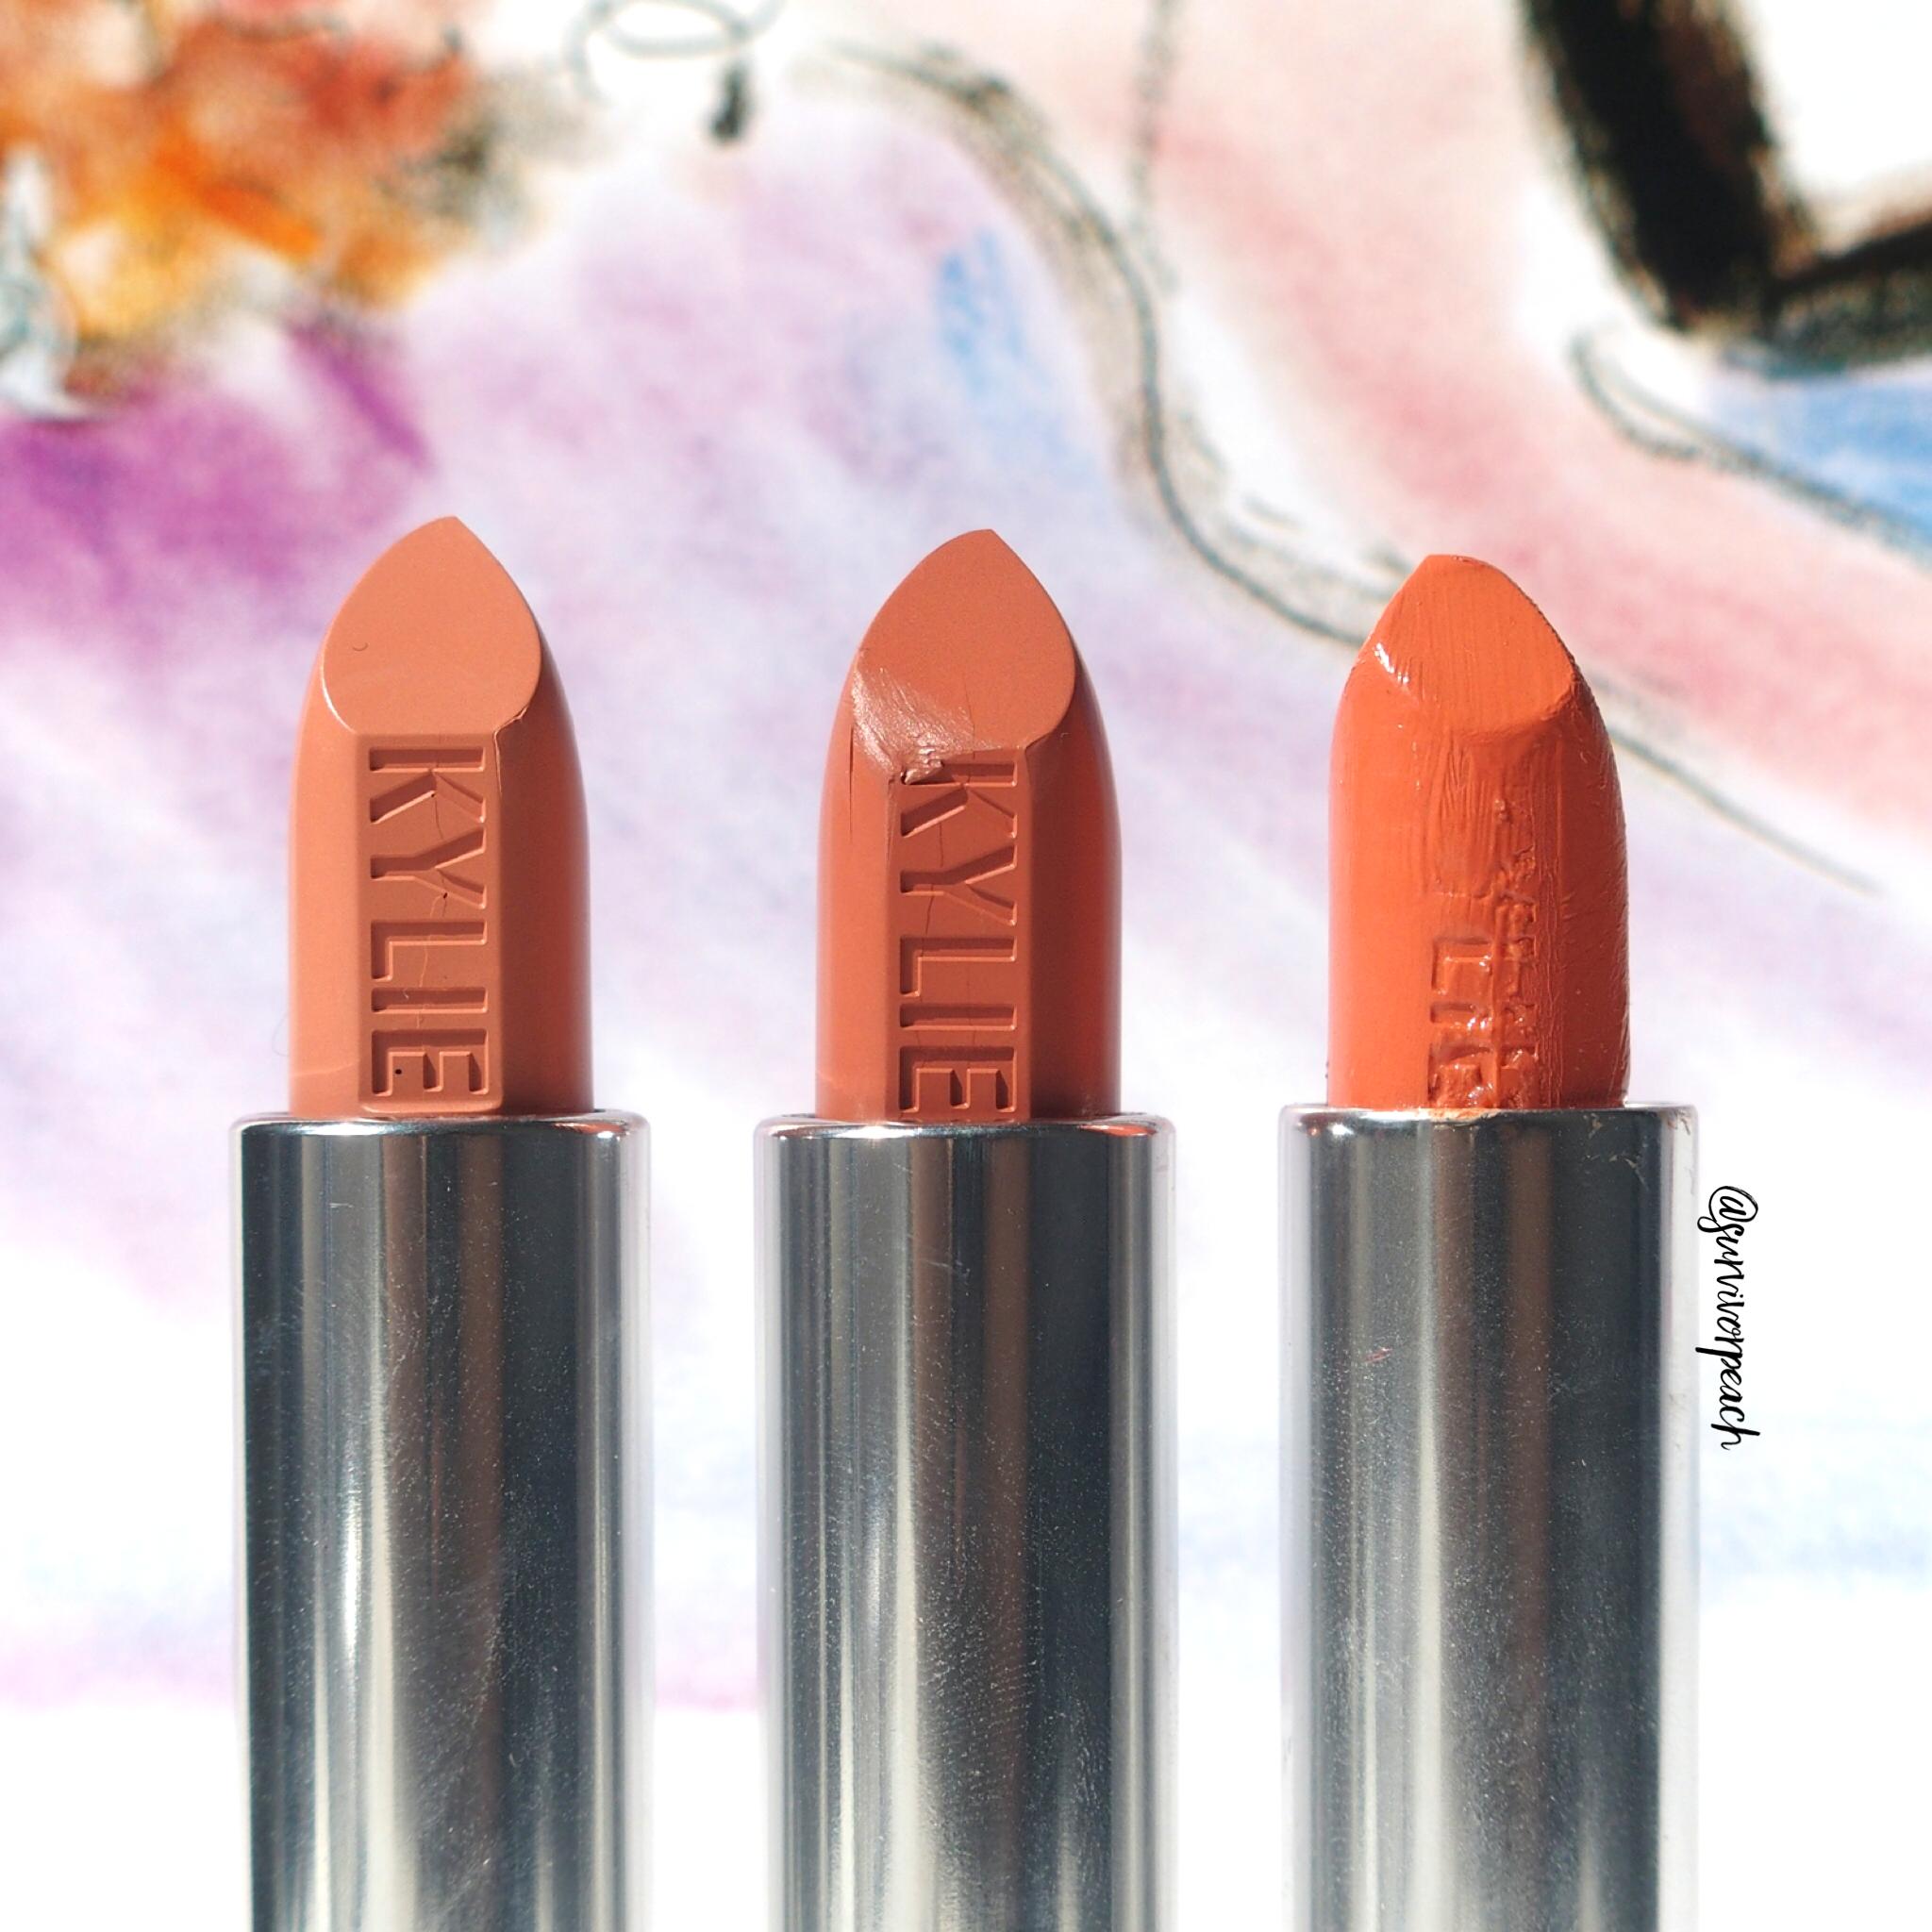 Kylie Cosmetics Creme lipstick in shades Butterscotch, Dulce De Leche, Sherbet